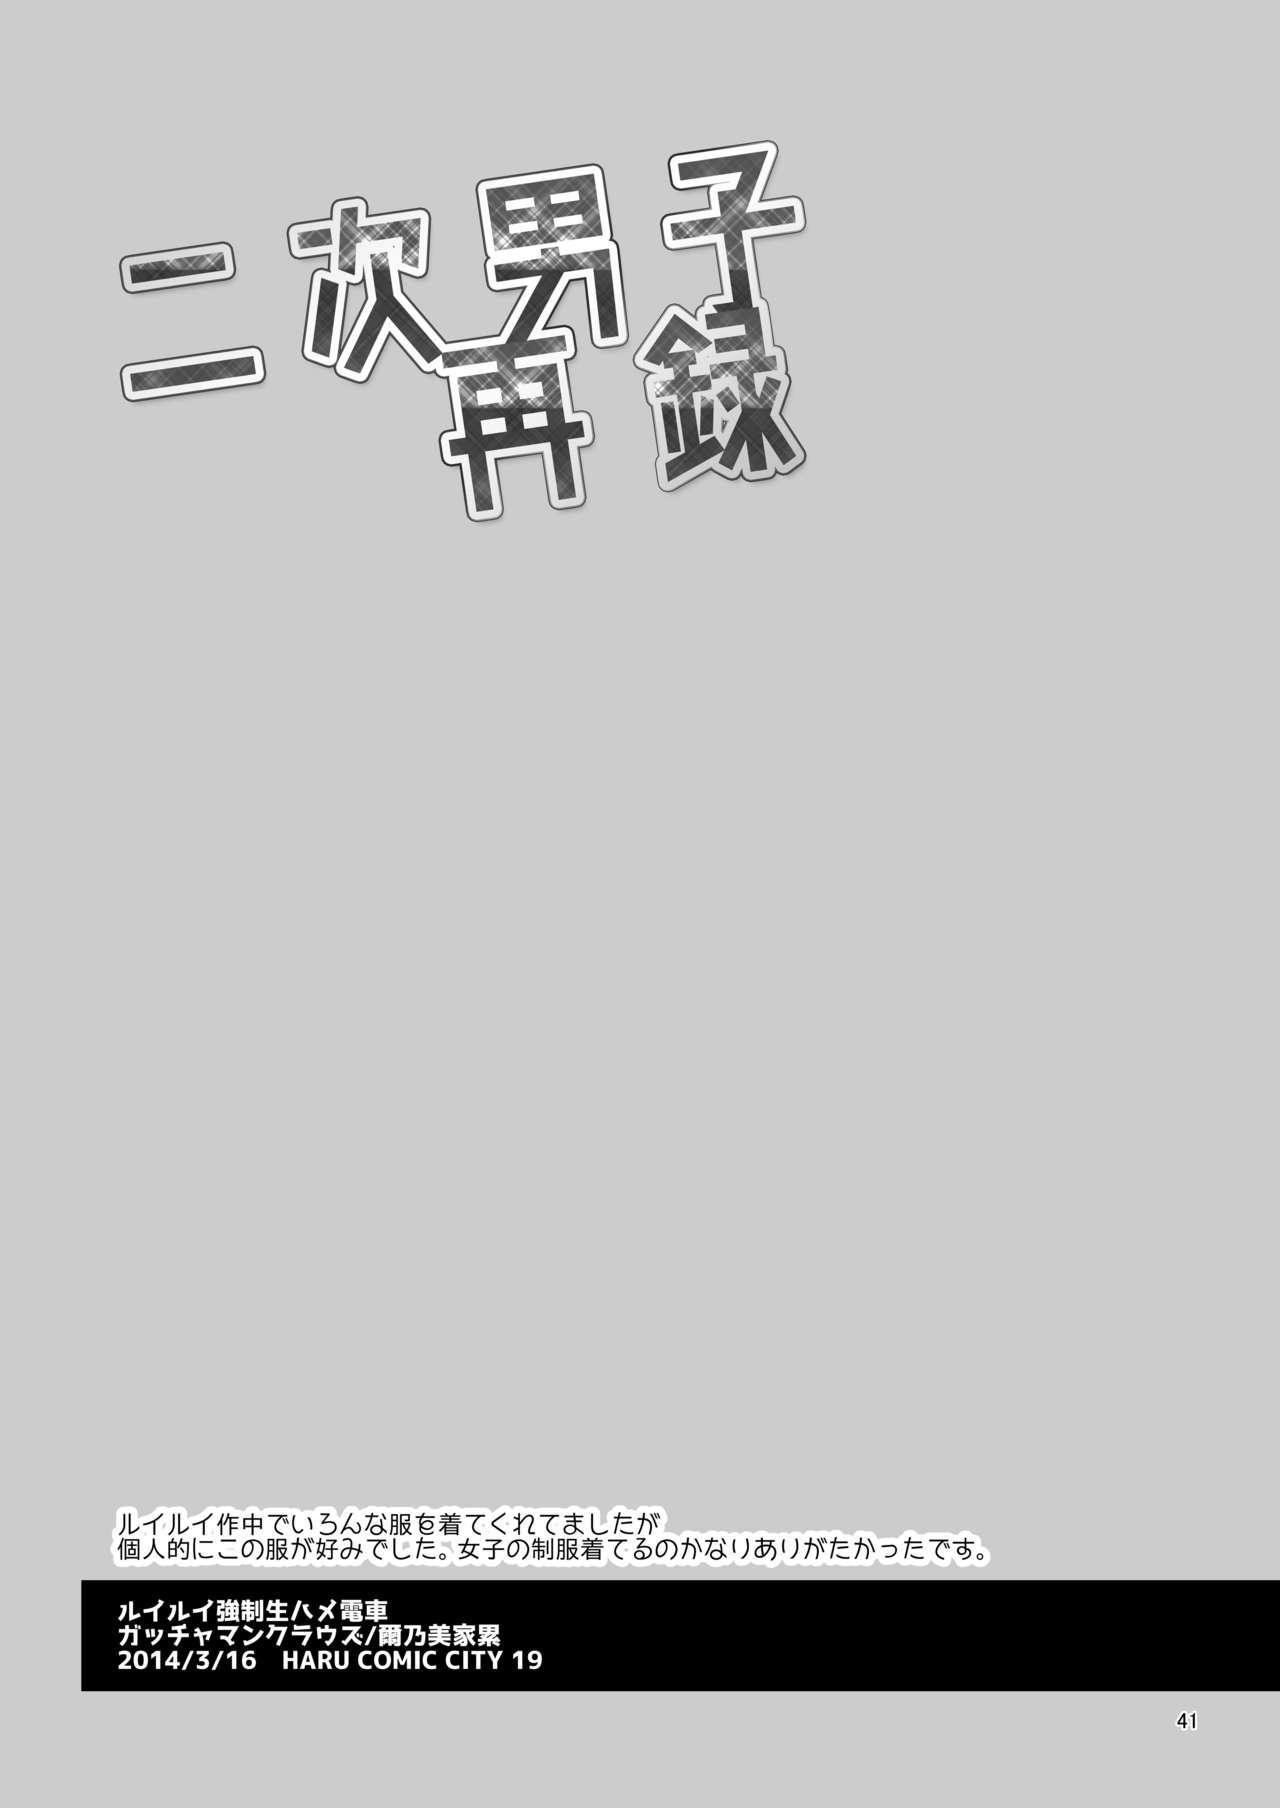 Niji Danshi Rerelease 41